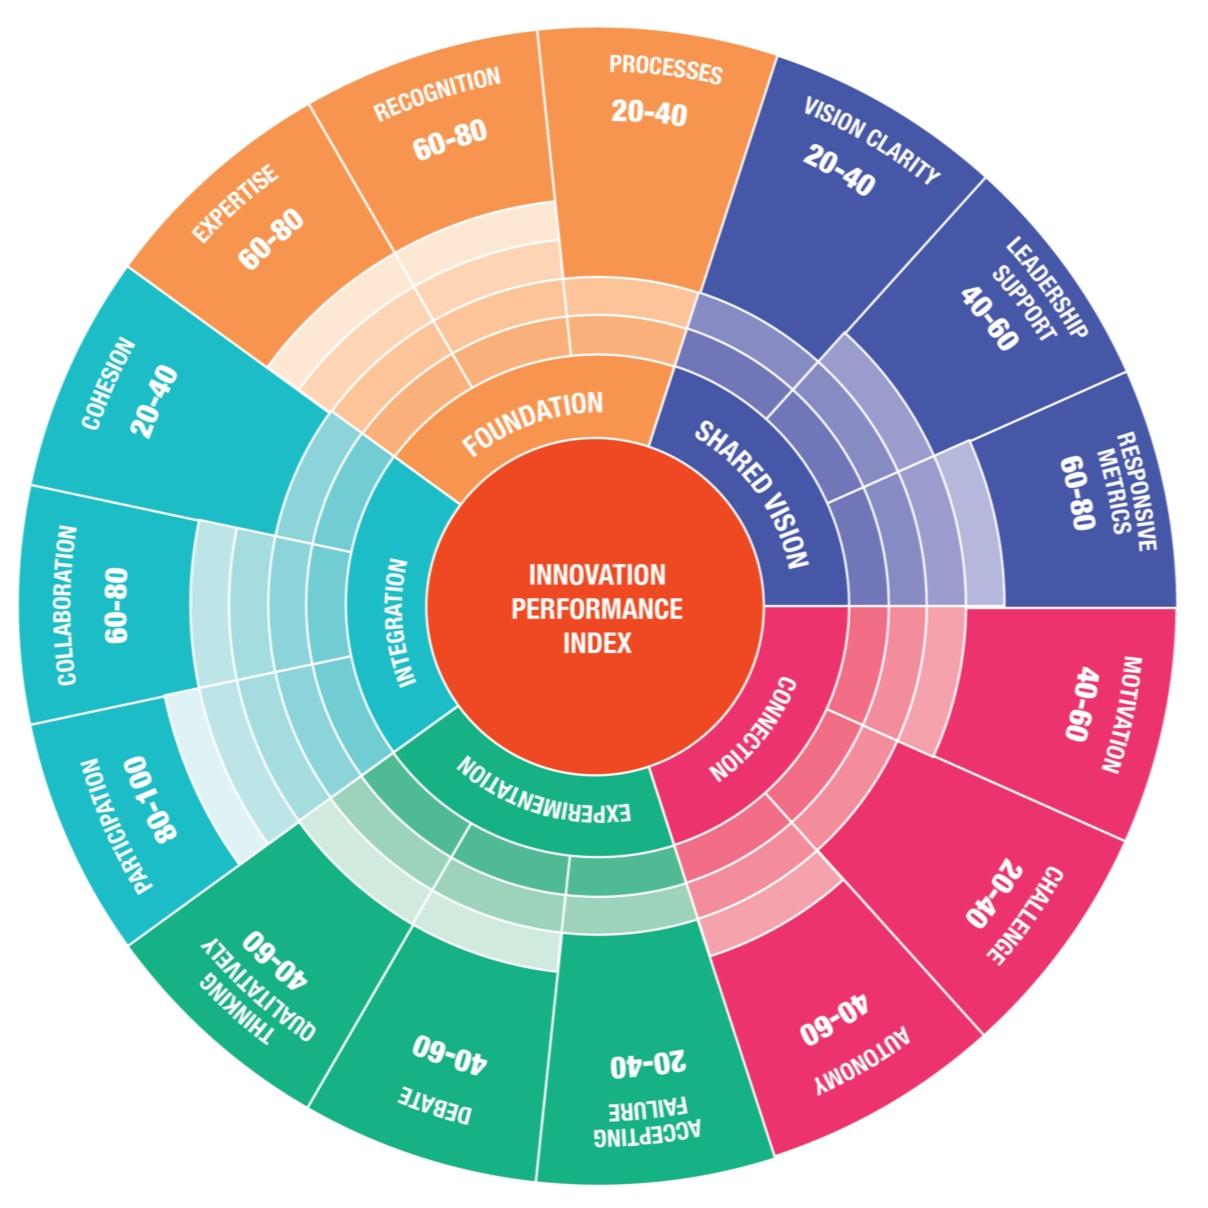 Innovation+performance+wheel.jpg